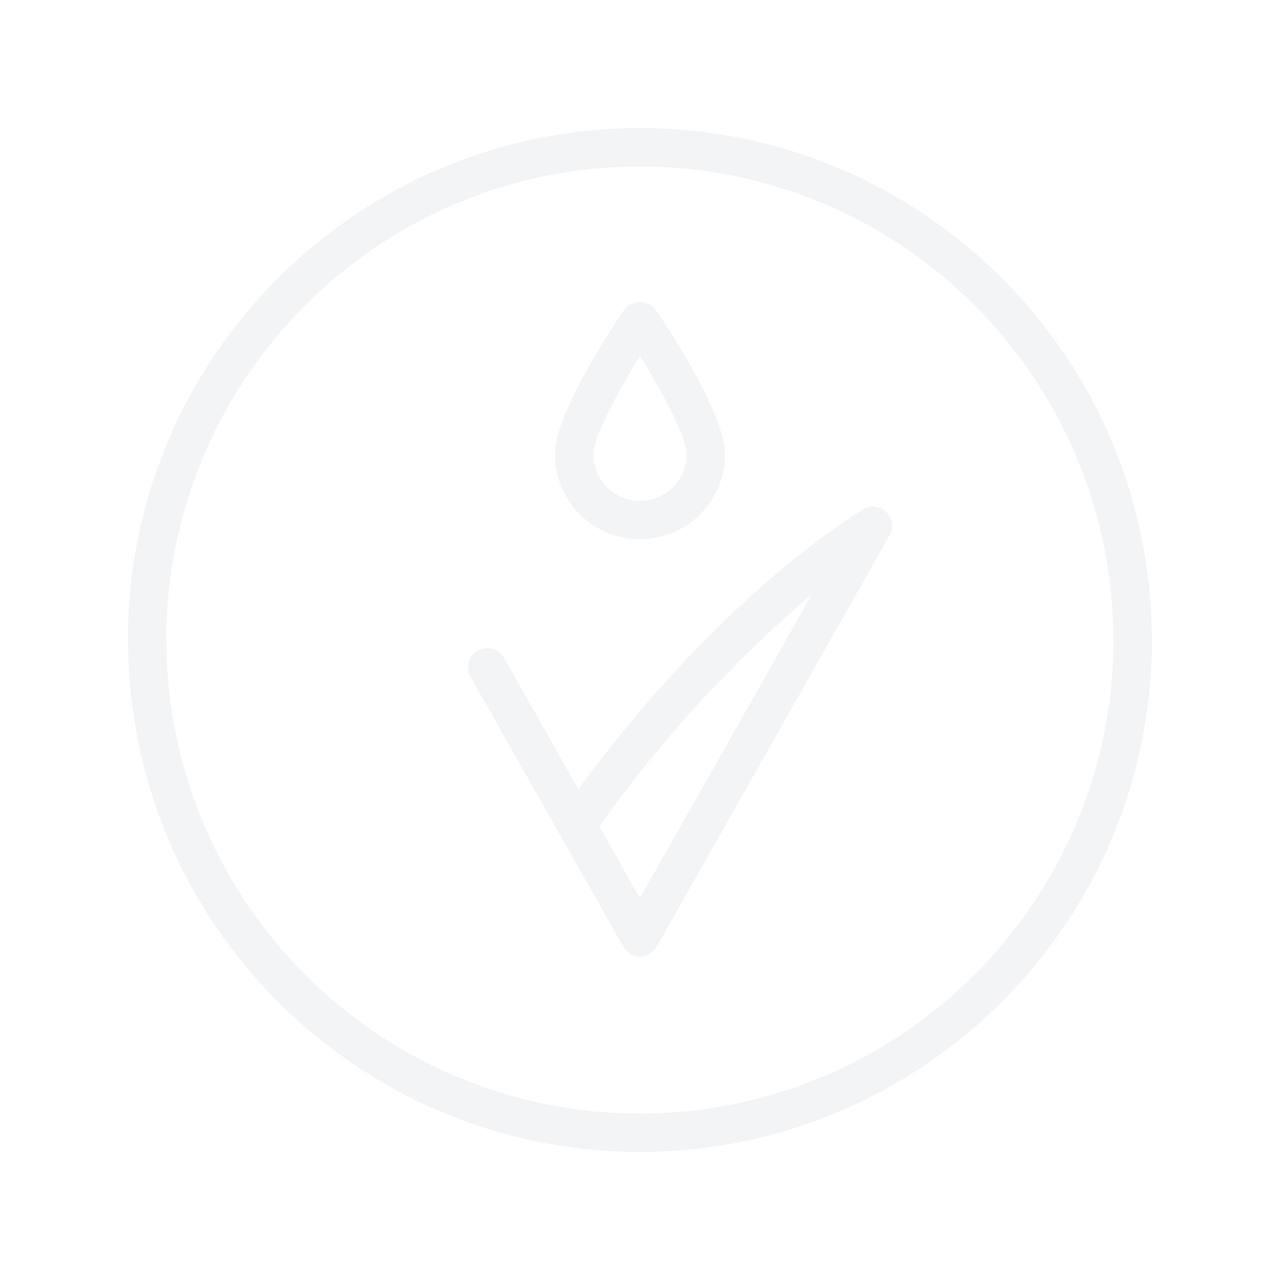 HOLIKA HOLIKA Prime Youth Gold Caviar Foil Mask 25g